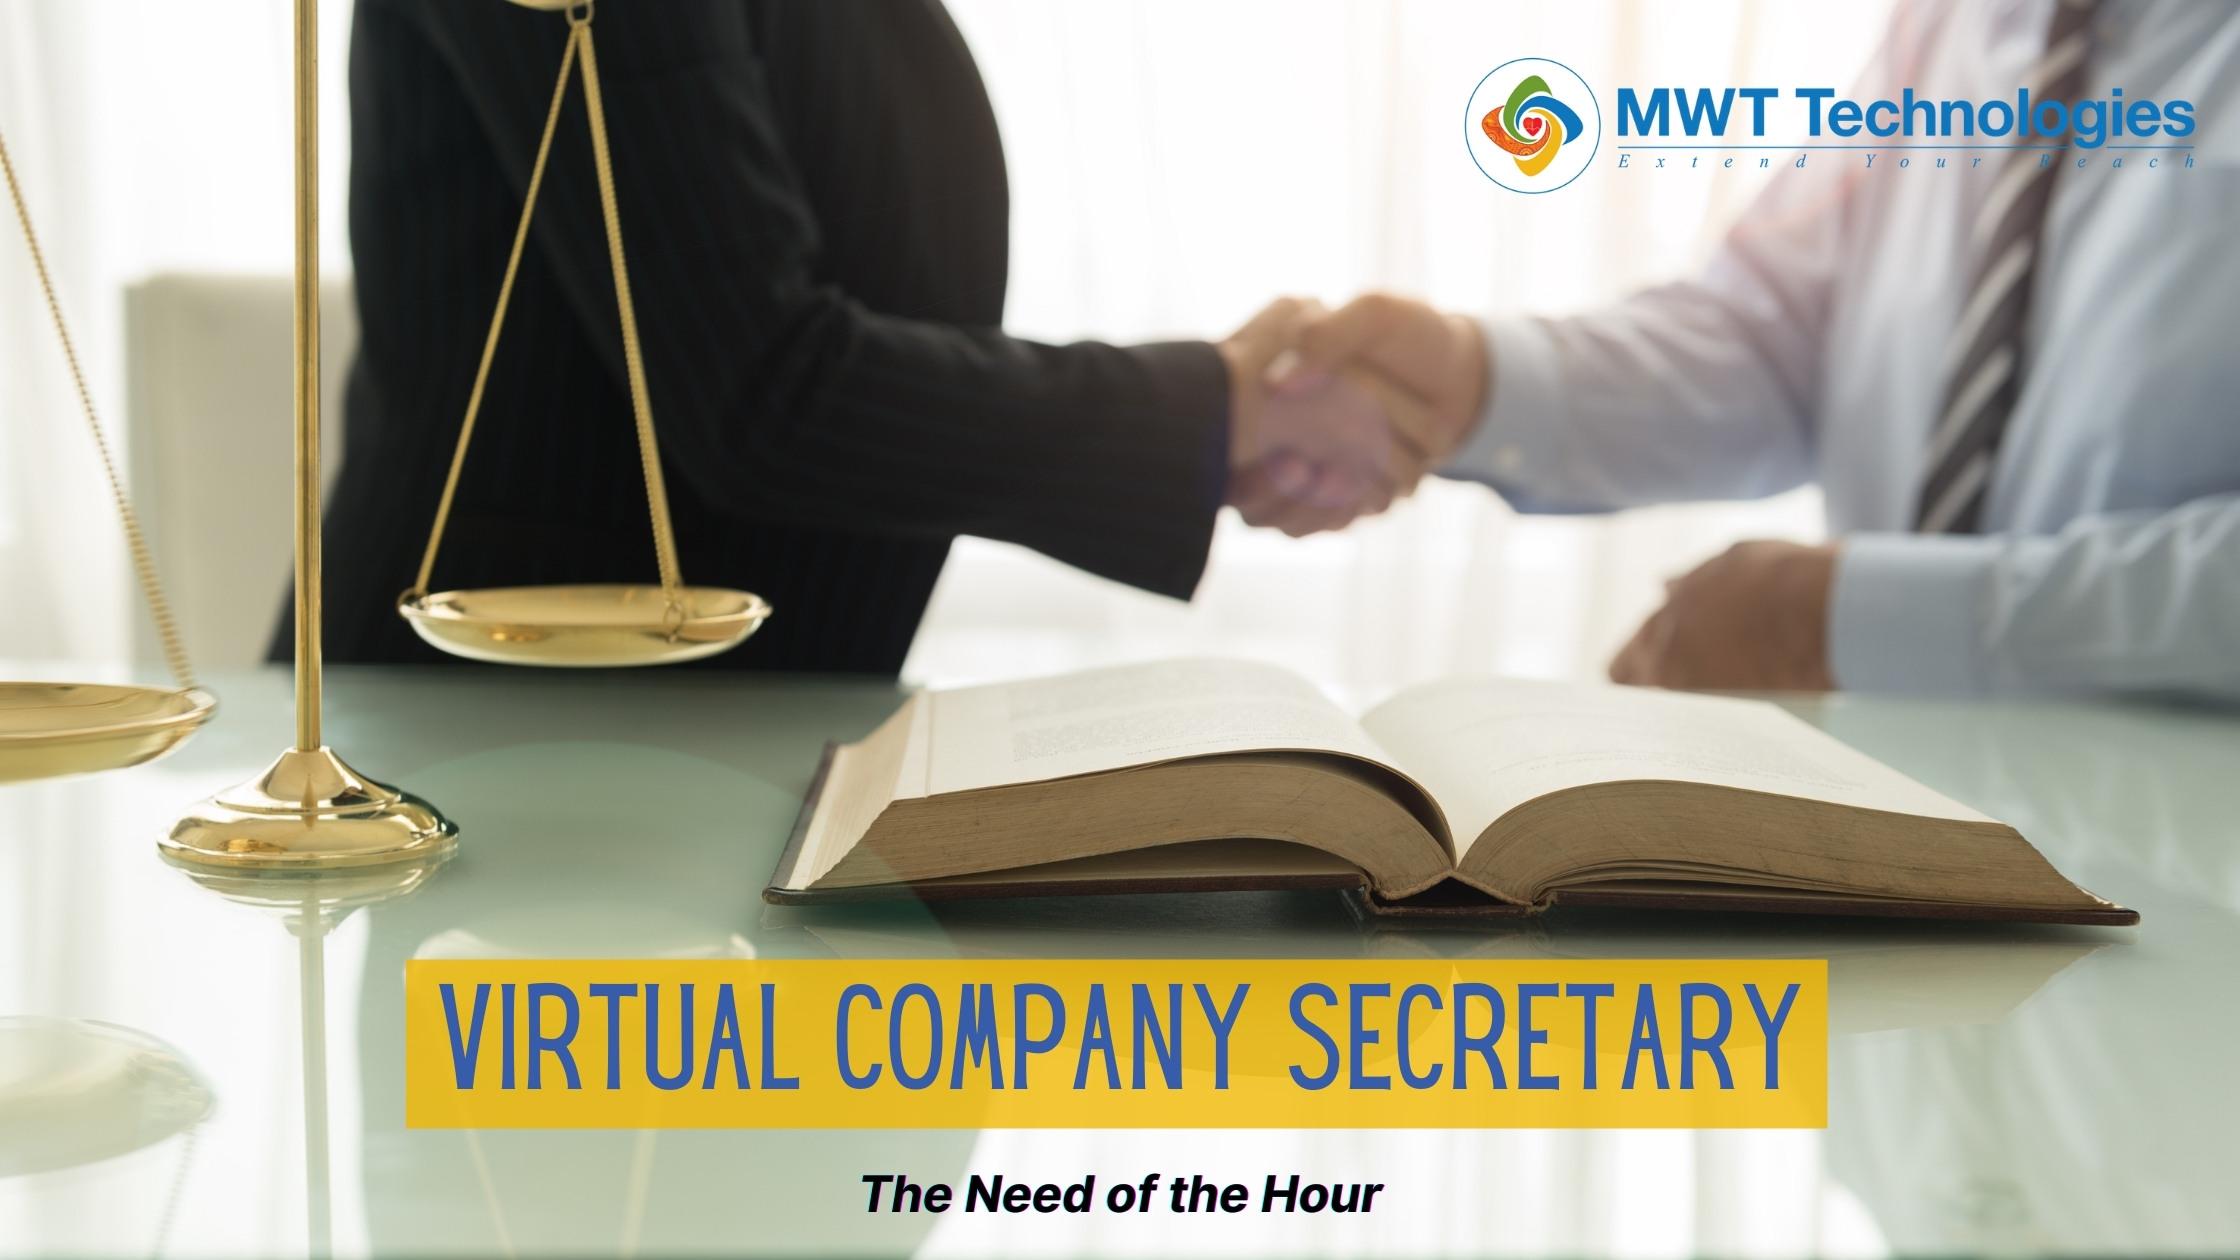 Virtual Company Secretary: The Need of the Hour